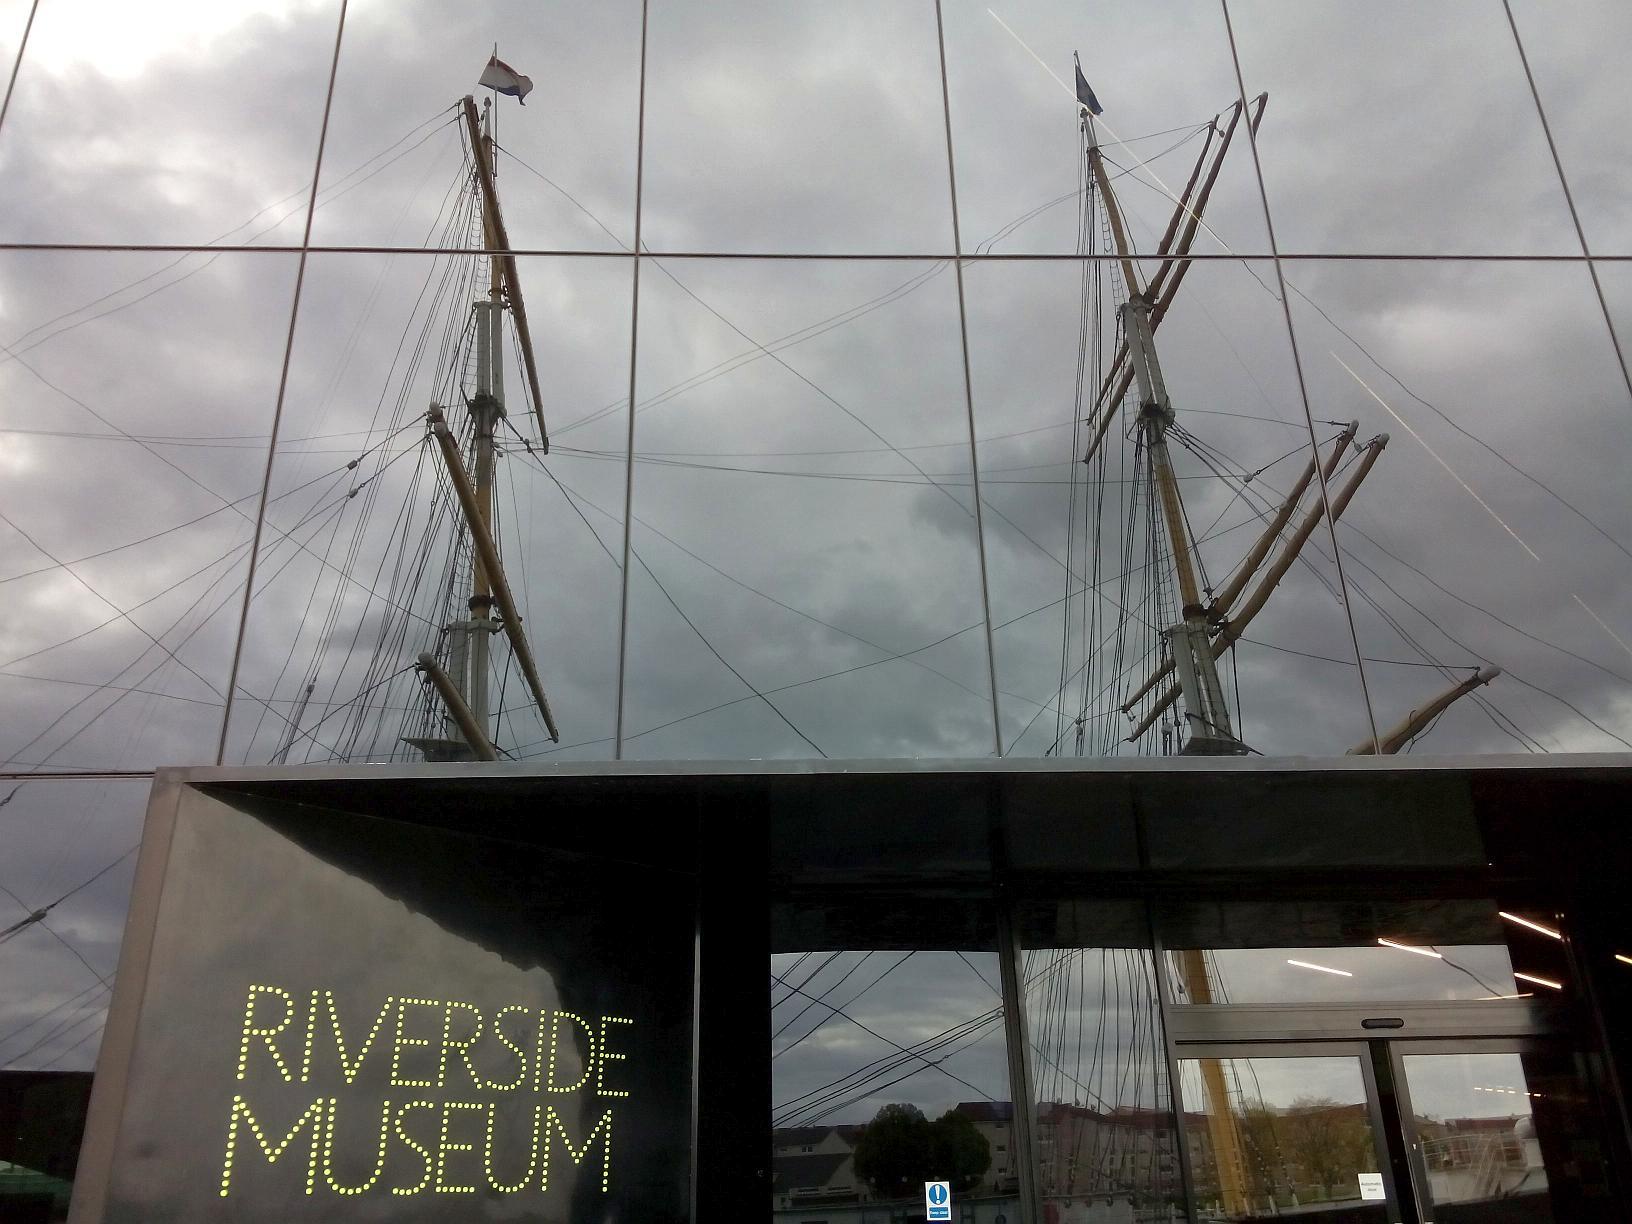 Riverside Museum mit Tallship, Glasgow